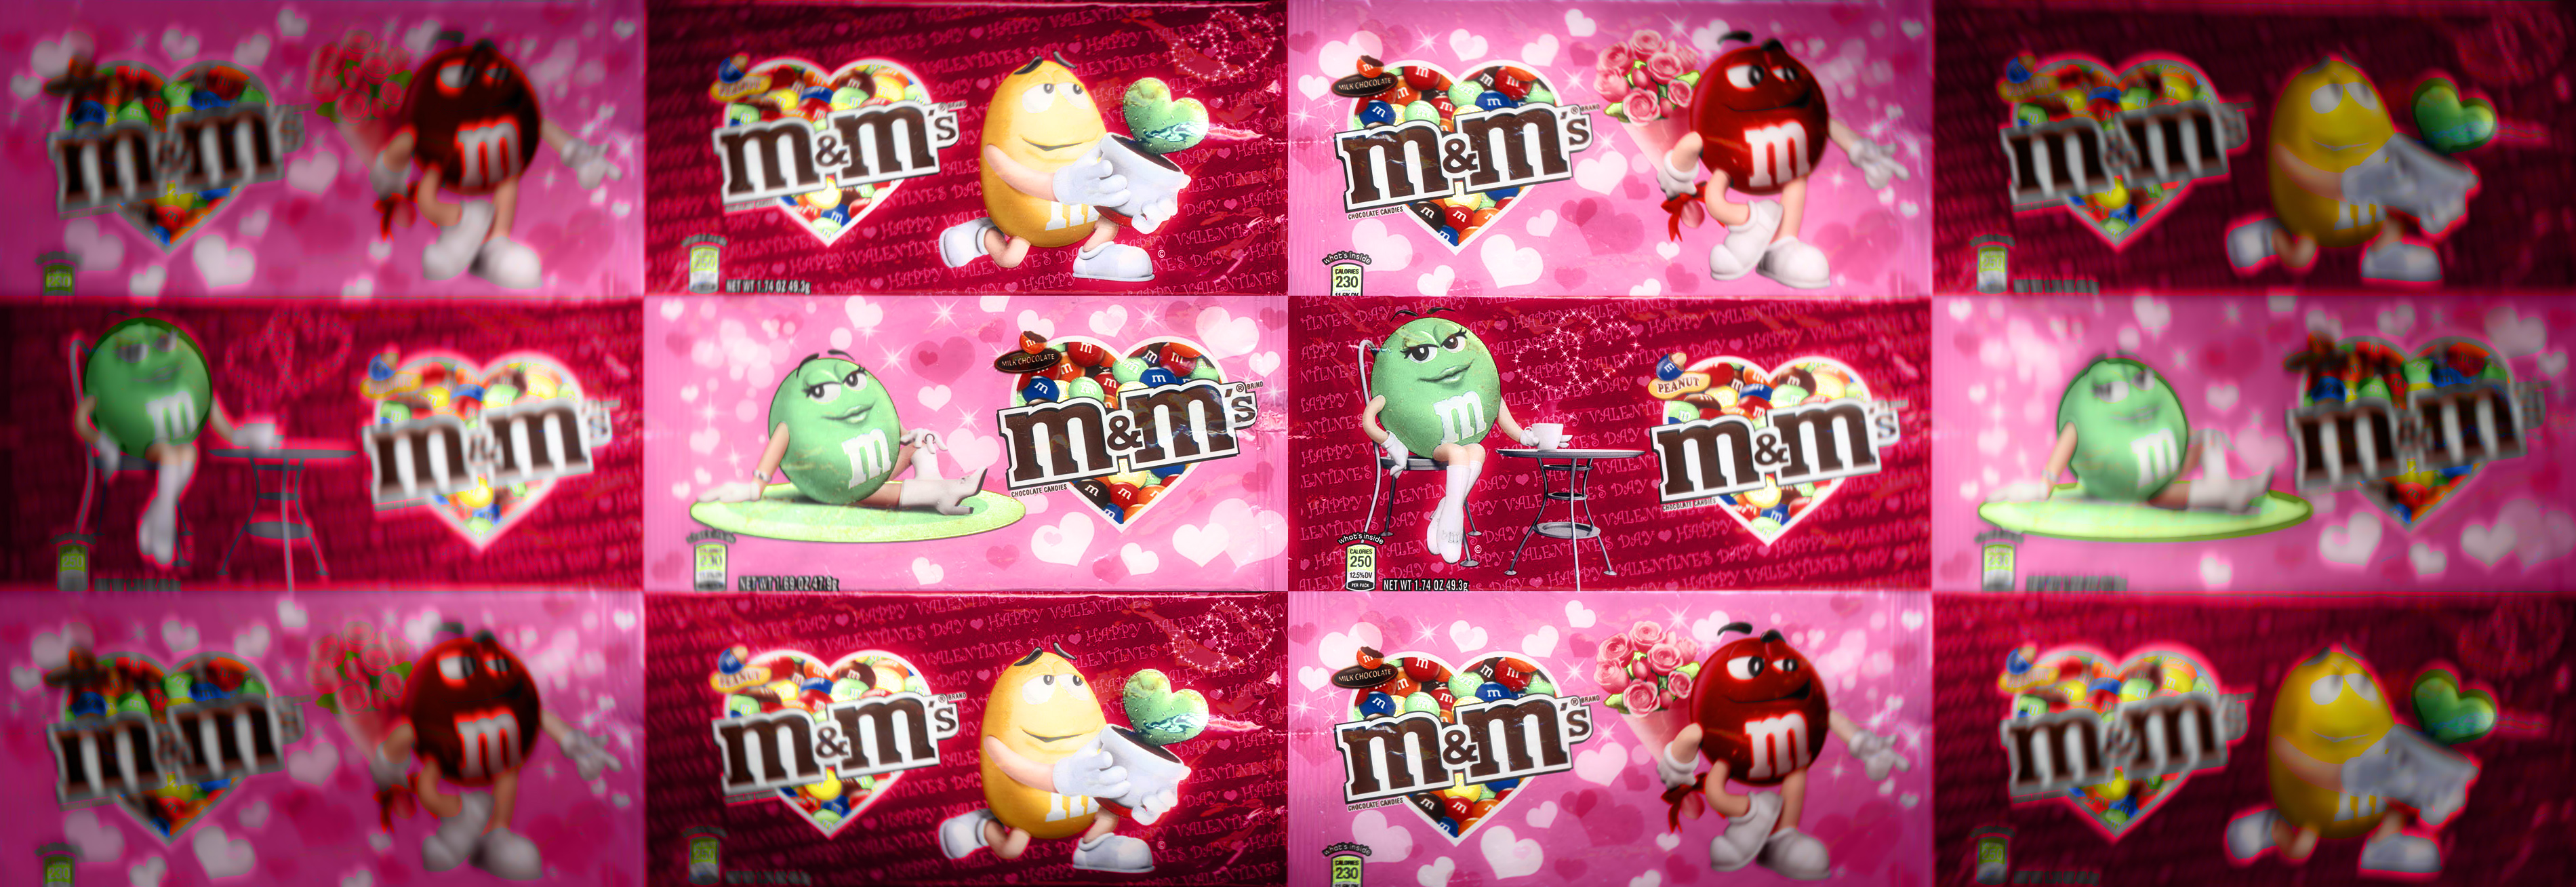 Taiwan Valentine M&M's CLOSING IMAGE